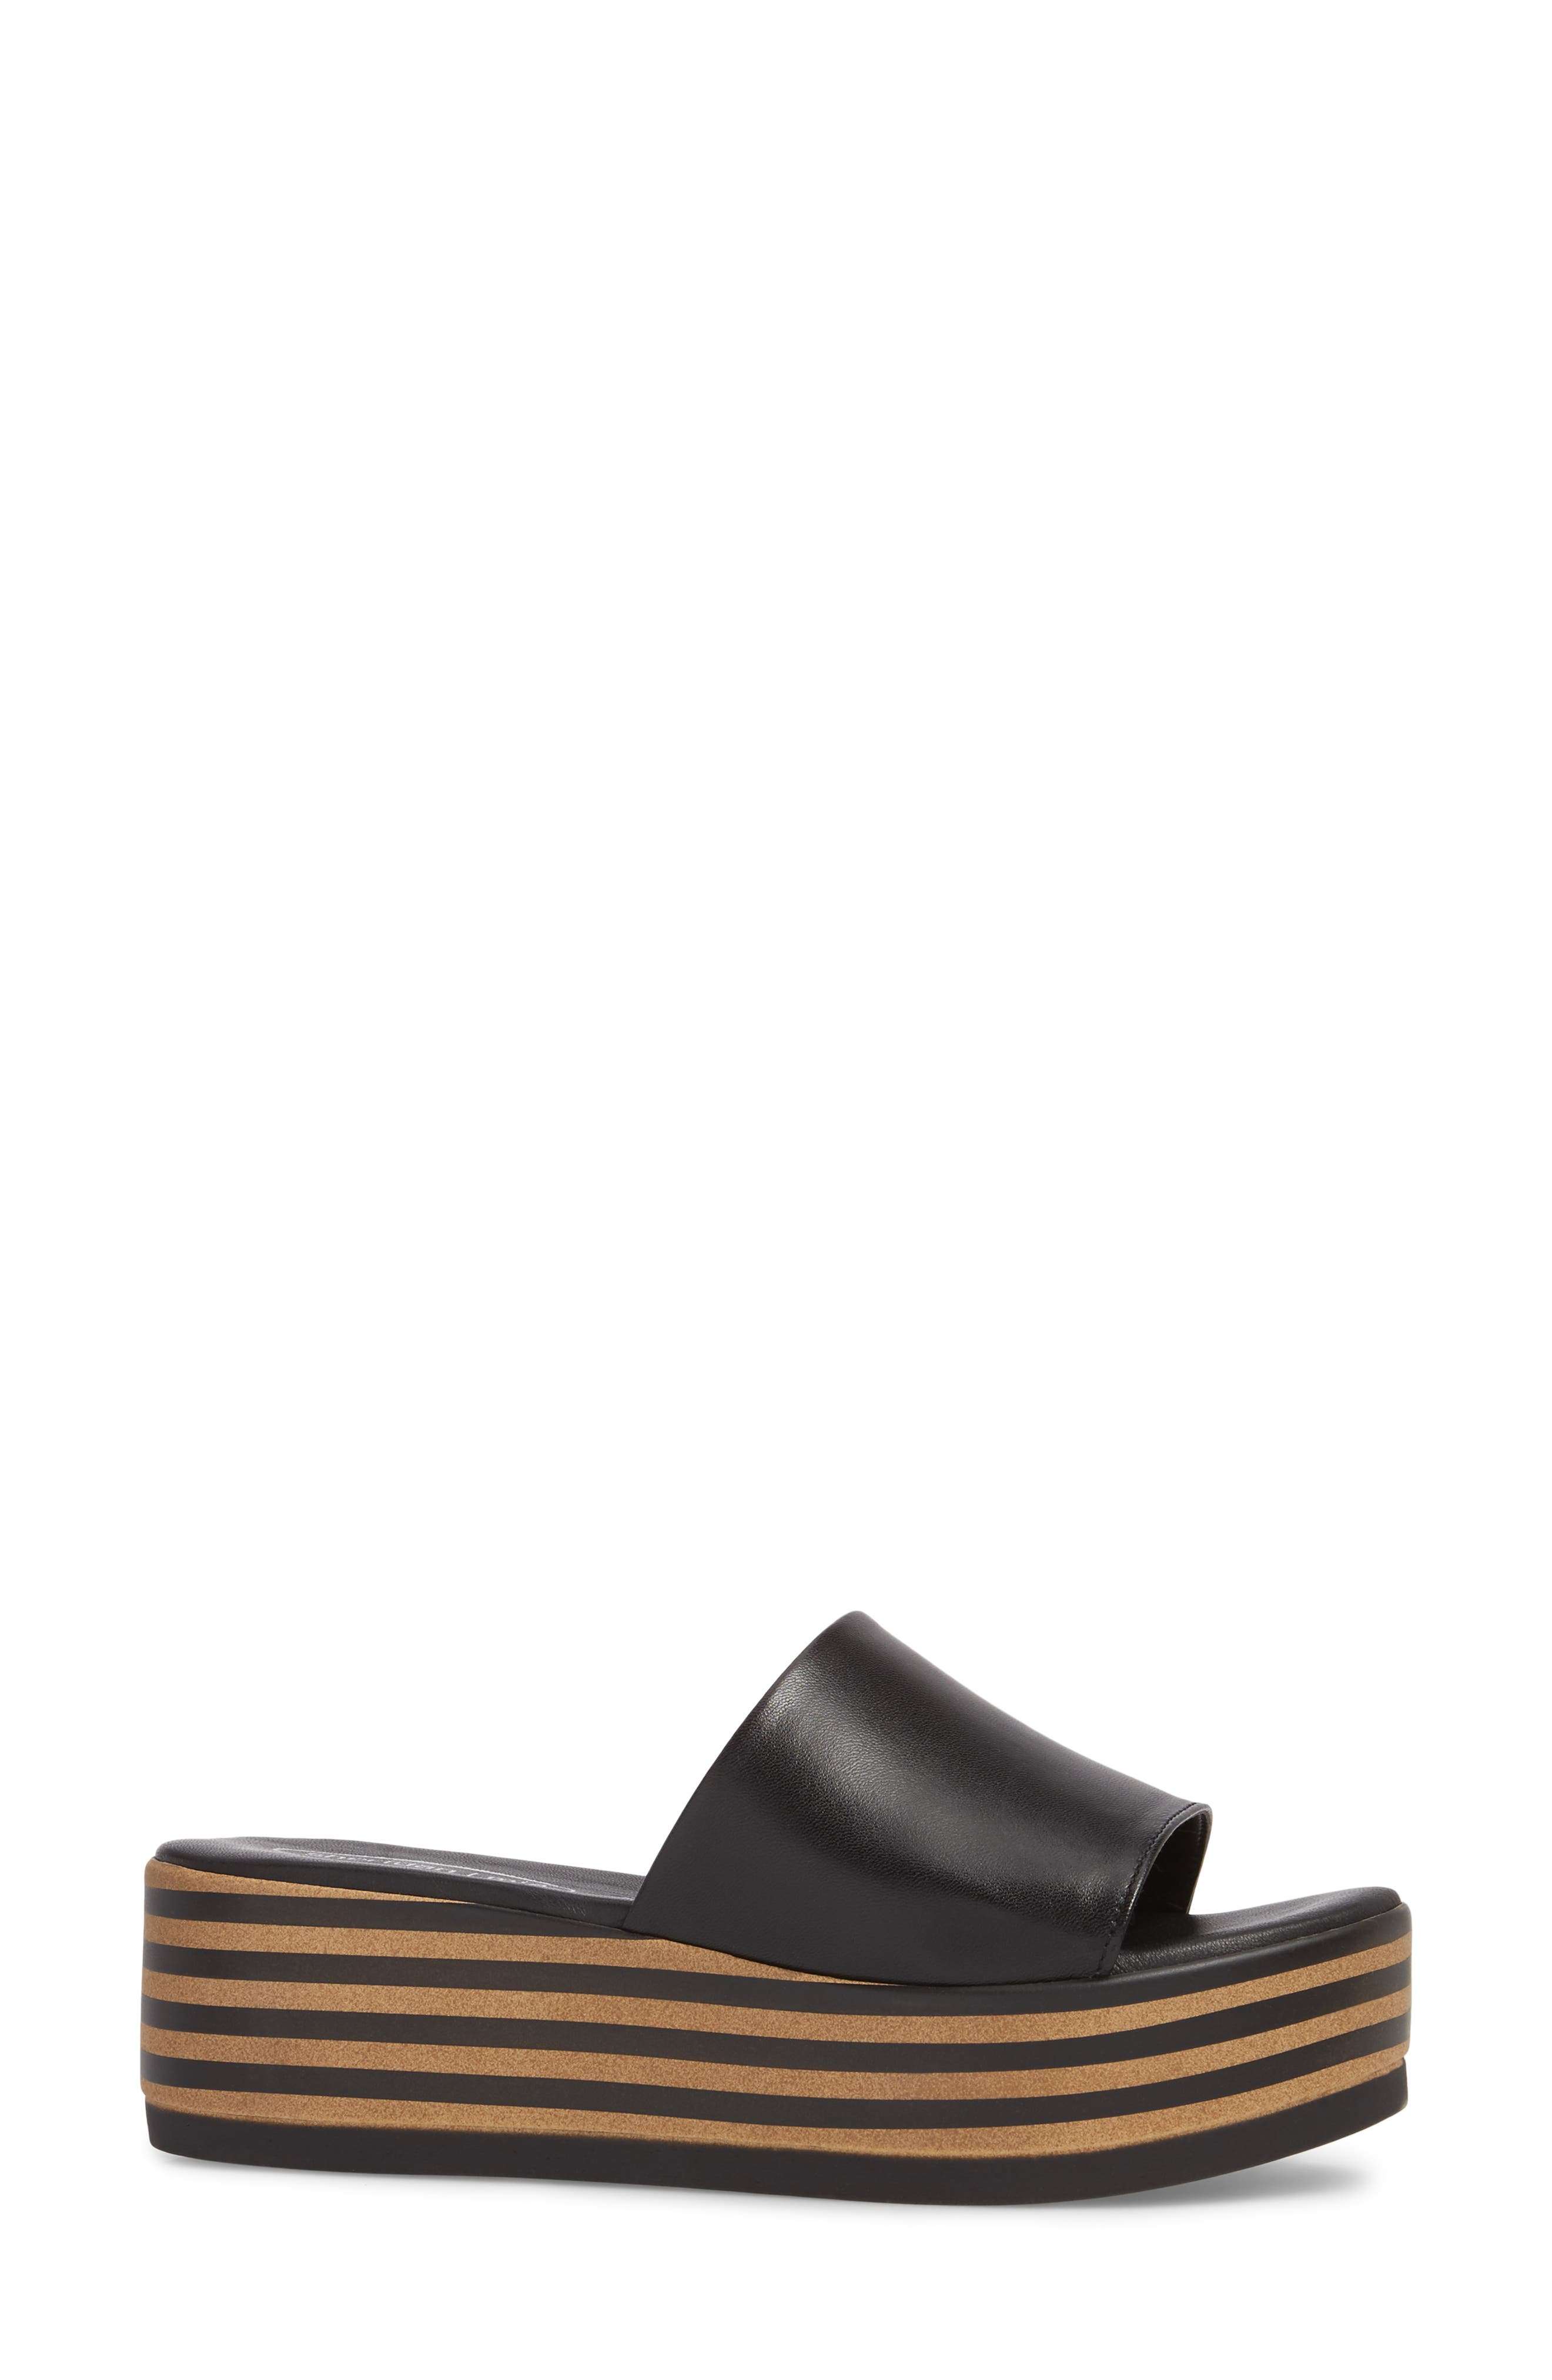 Reesa Platform Slide Sandal,                             Alternate thumbnail 3, color,                             Black Leather